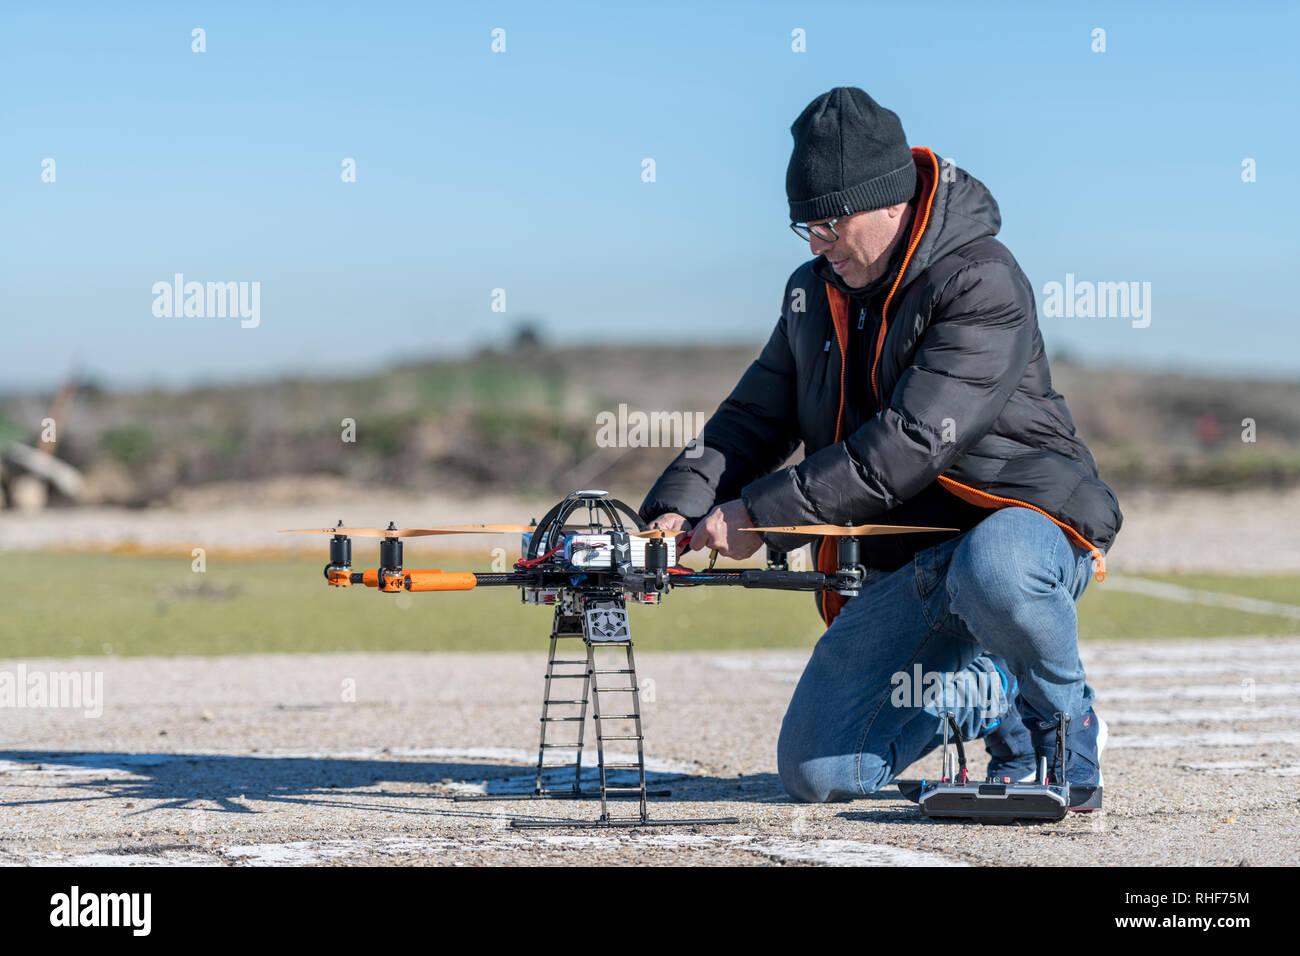 Remote pilot preparing professional drone before flight - Stock Image